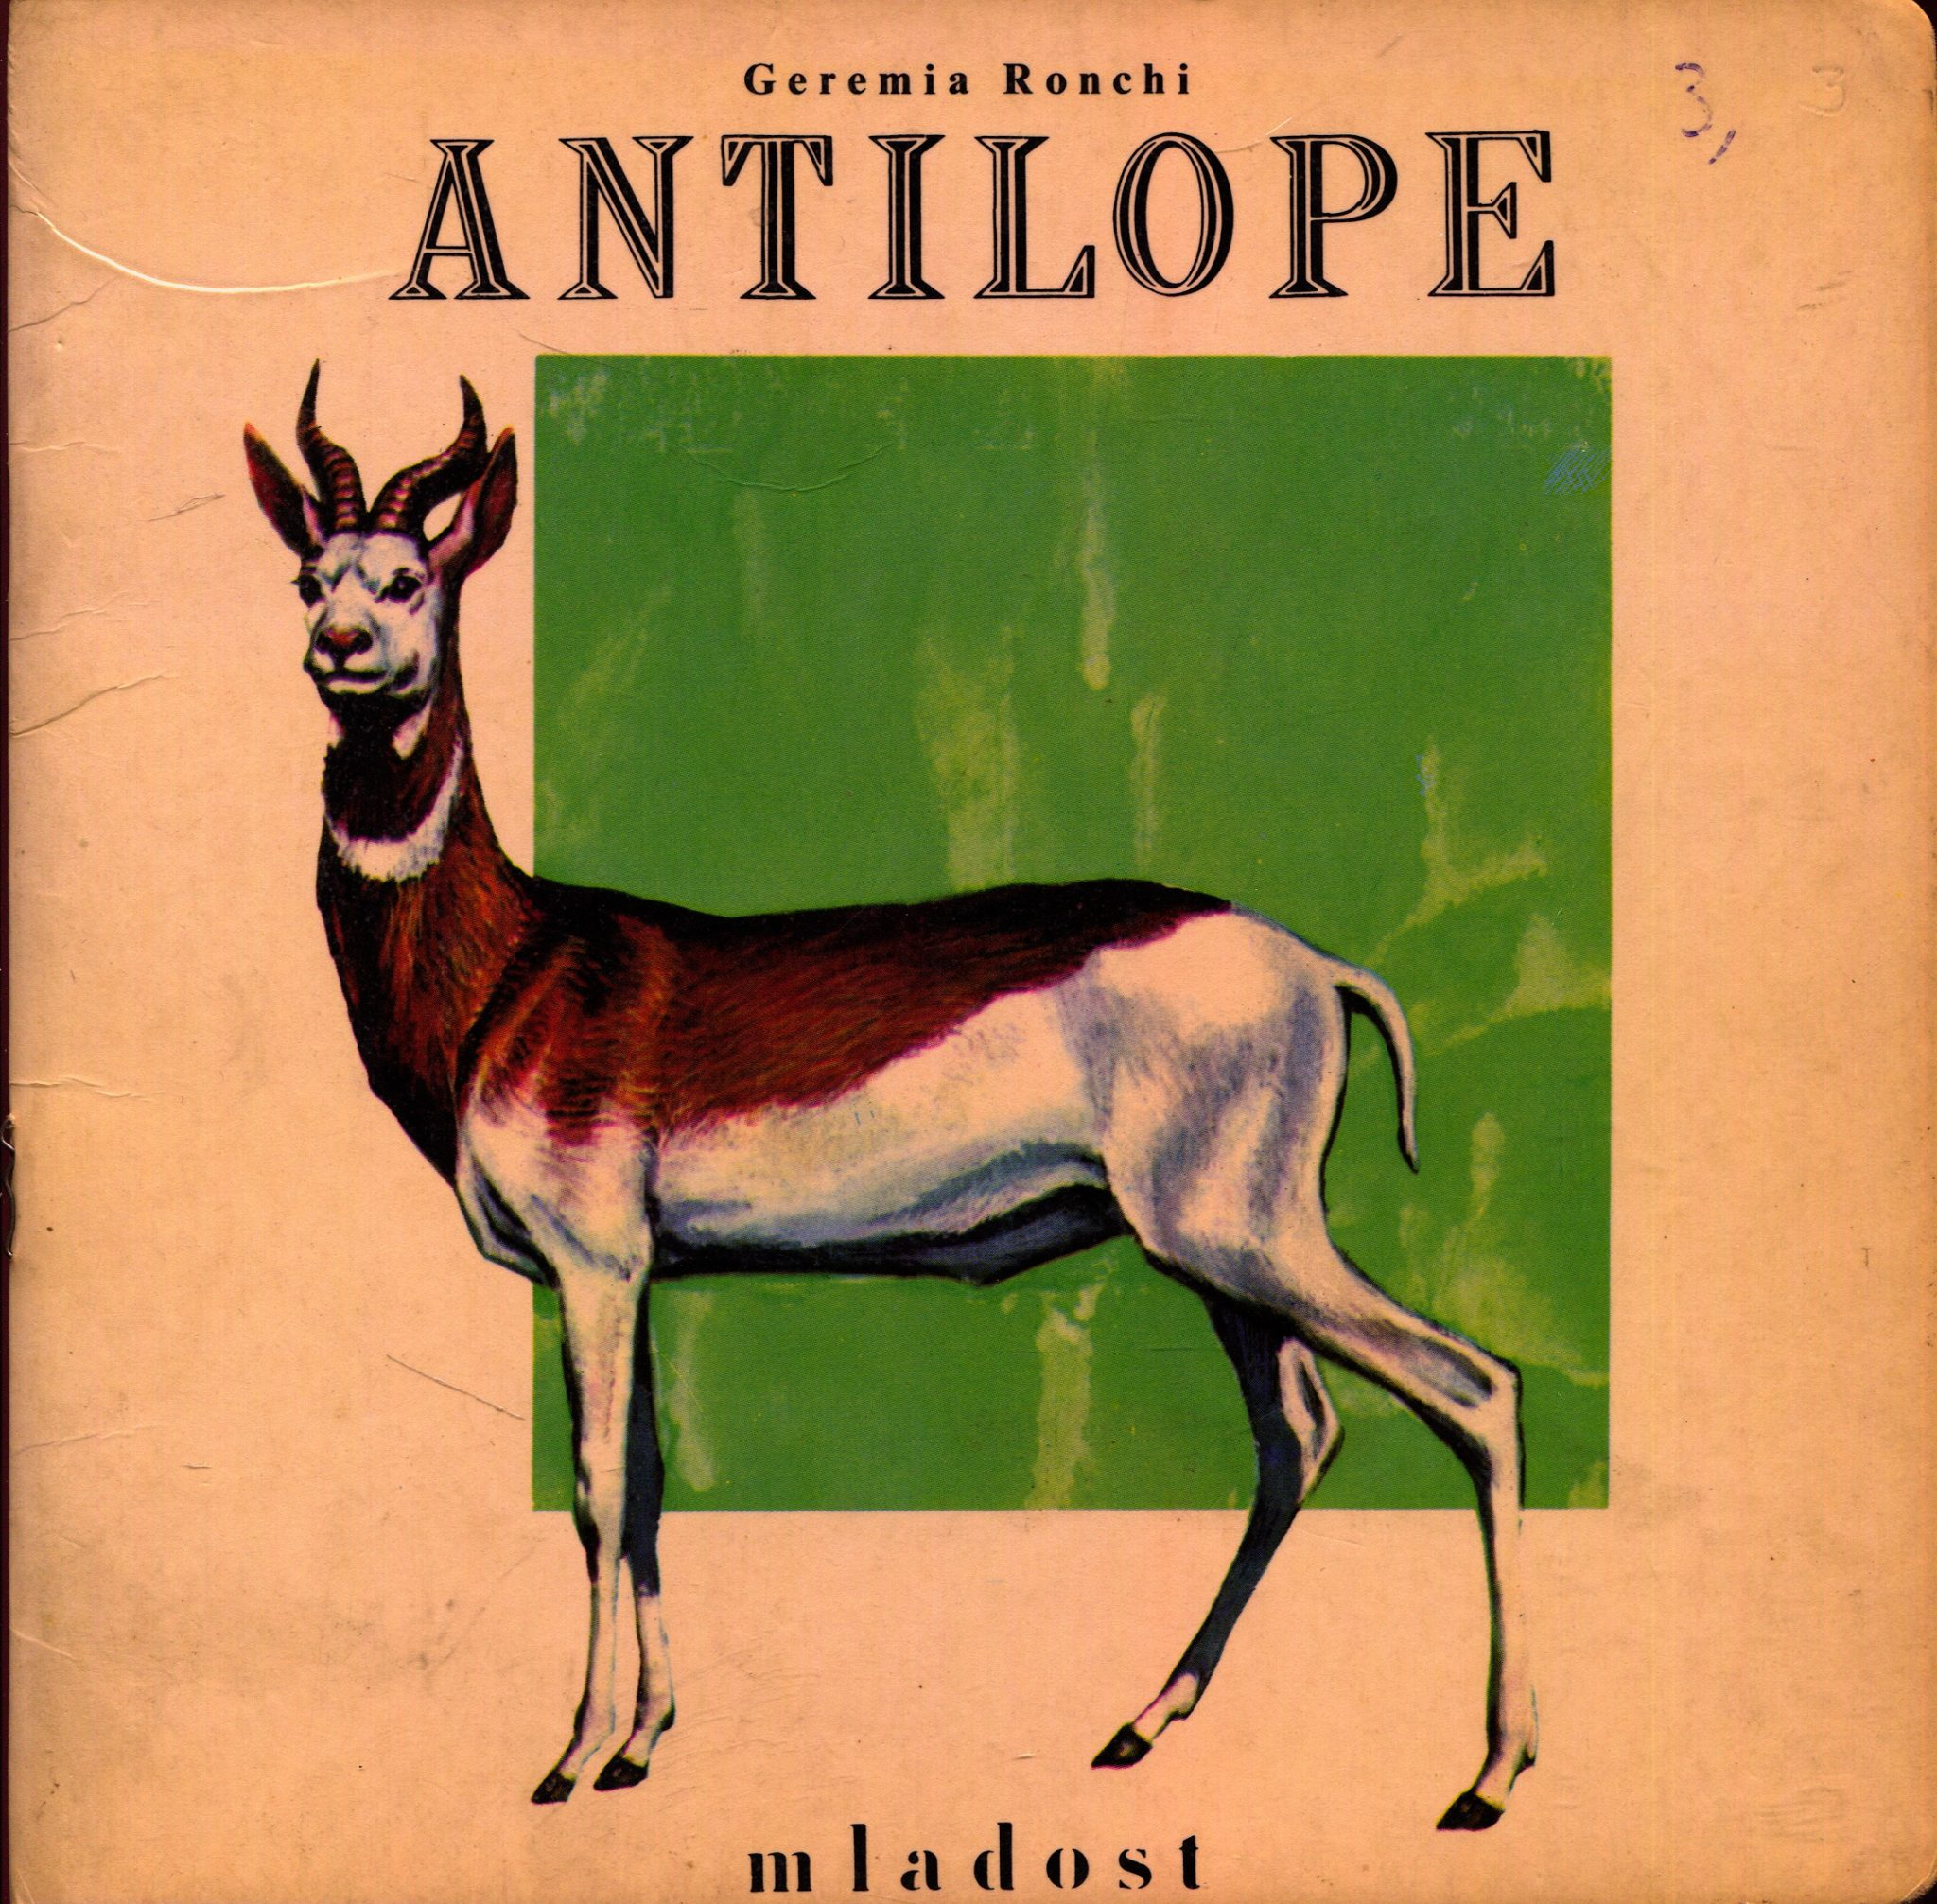 Antilope Geremia Ronchi